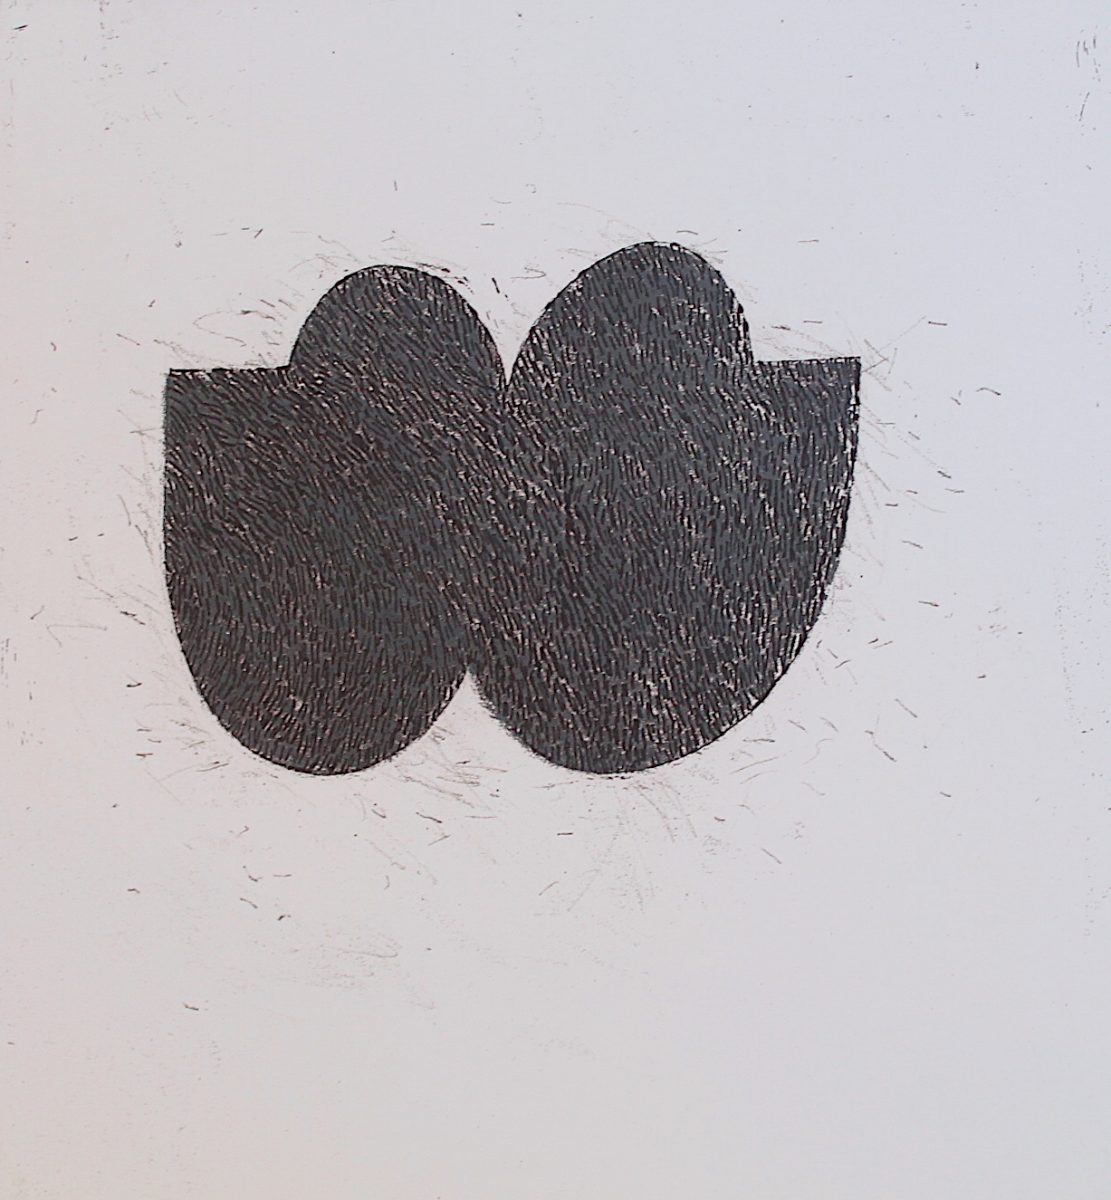 Graphic Studio Dublin: Selection, Kiss, Charles Tyrell